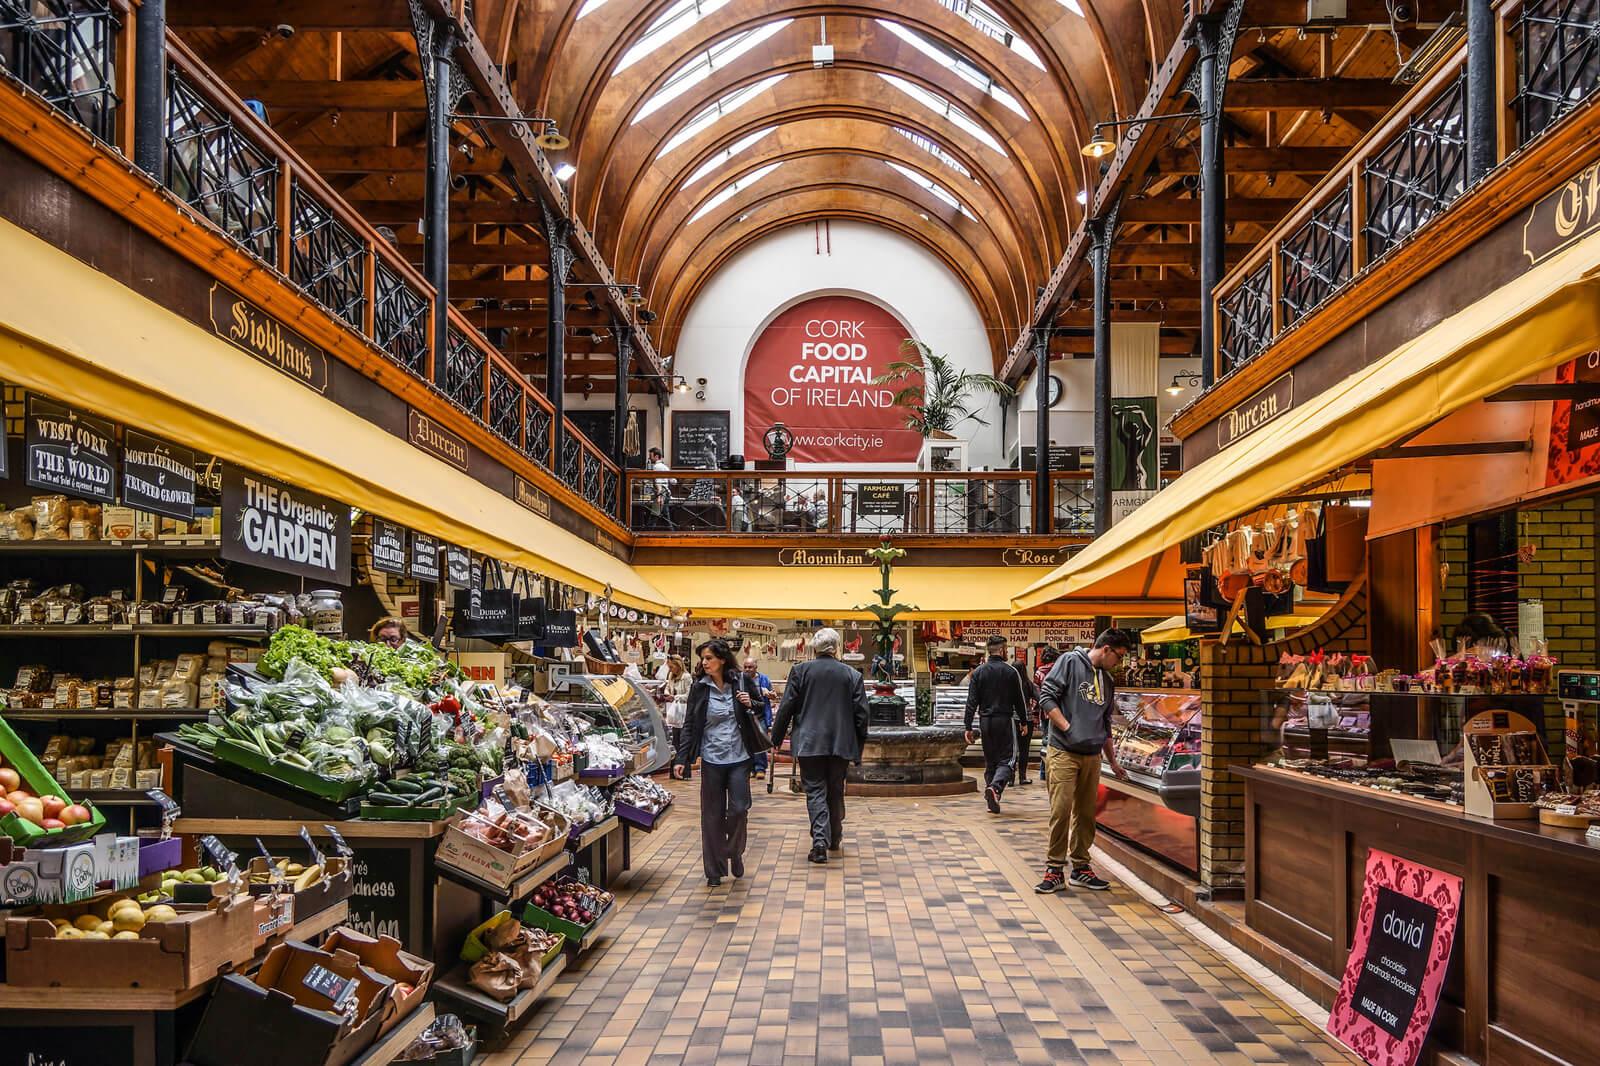 Поход по продуктовому рынку, Корк